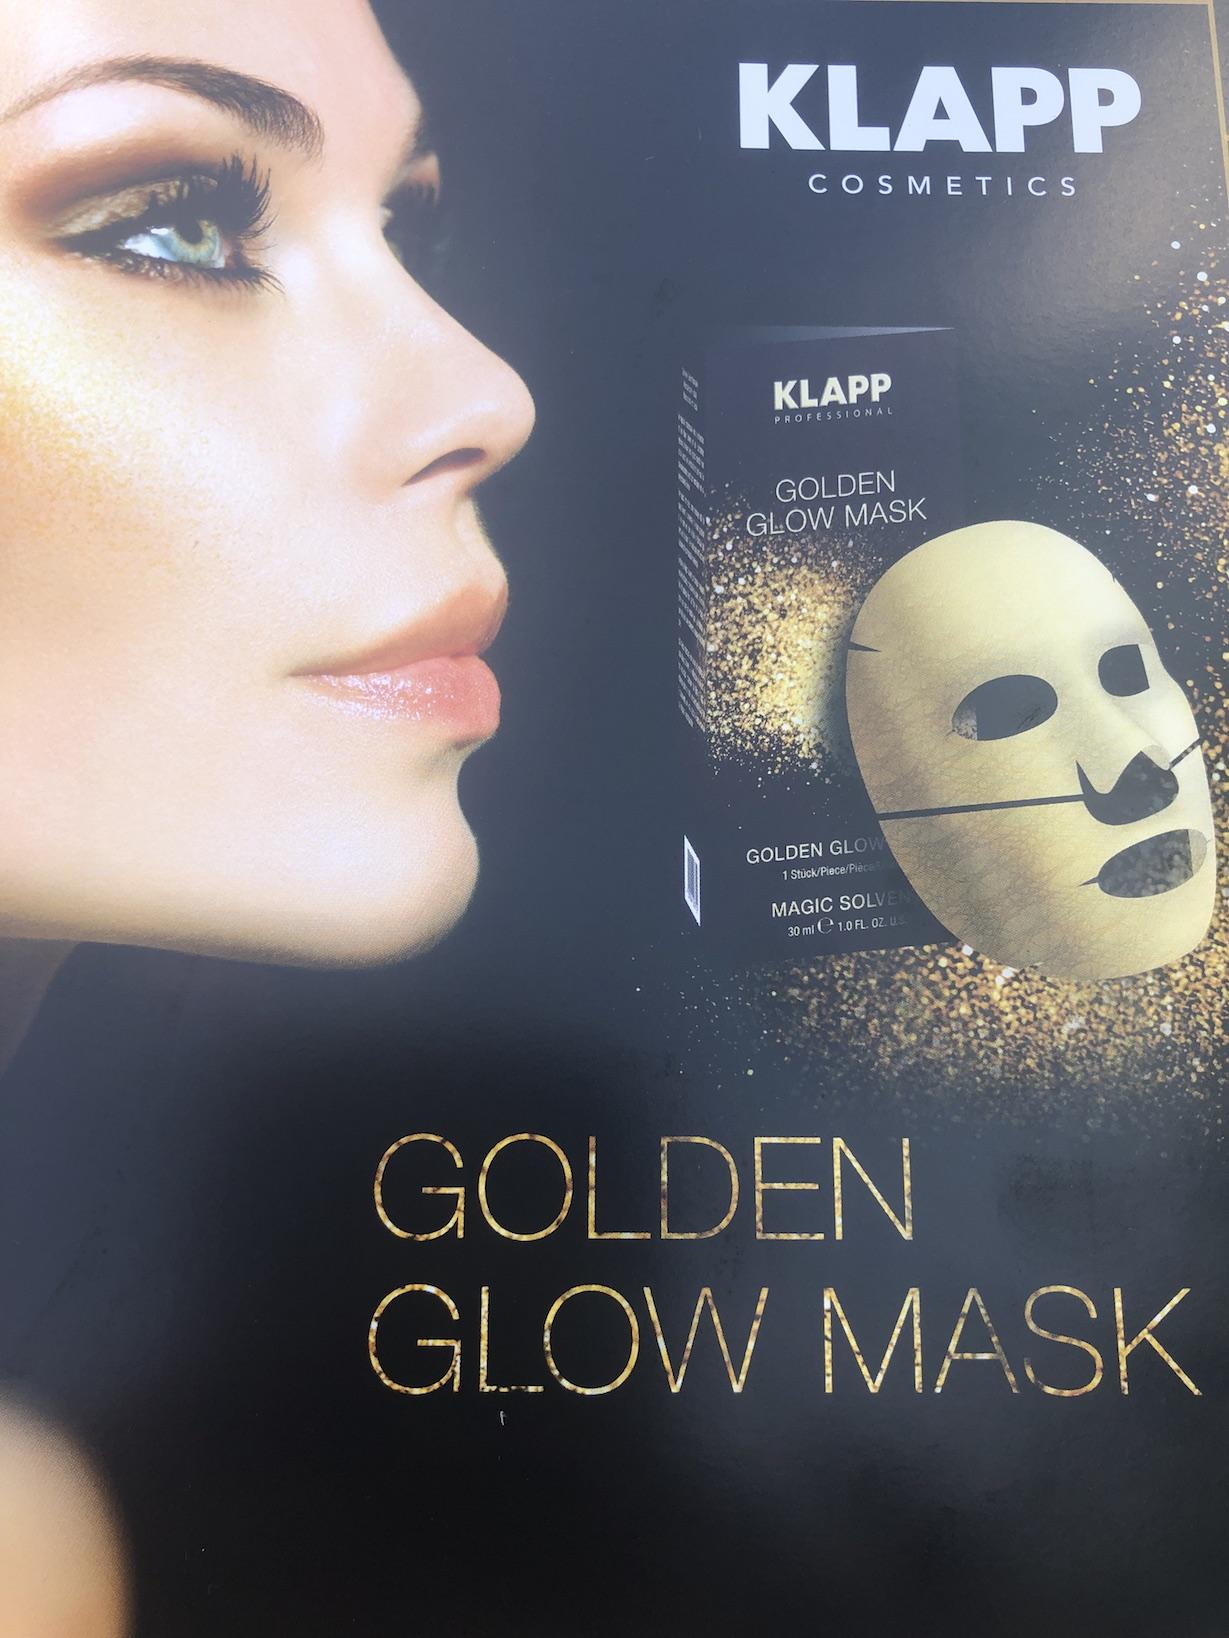 Spiders on your face? Klapp Cosmetics revolutionizes again